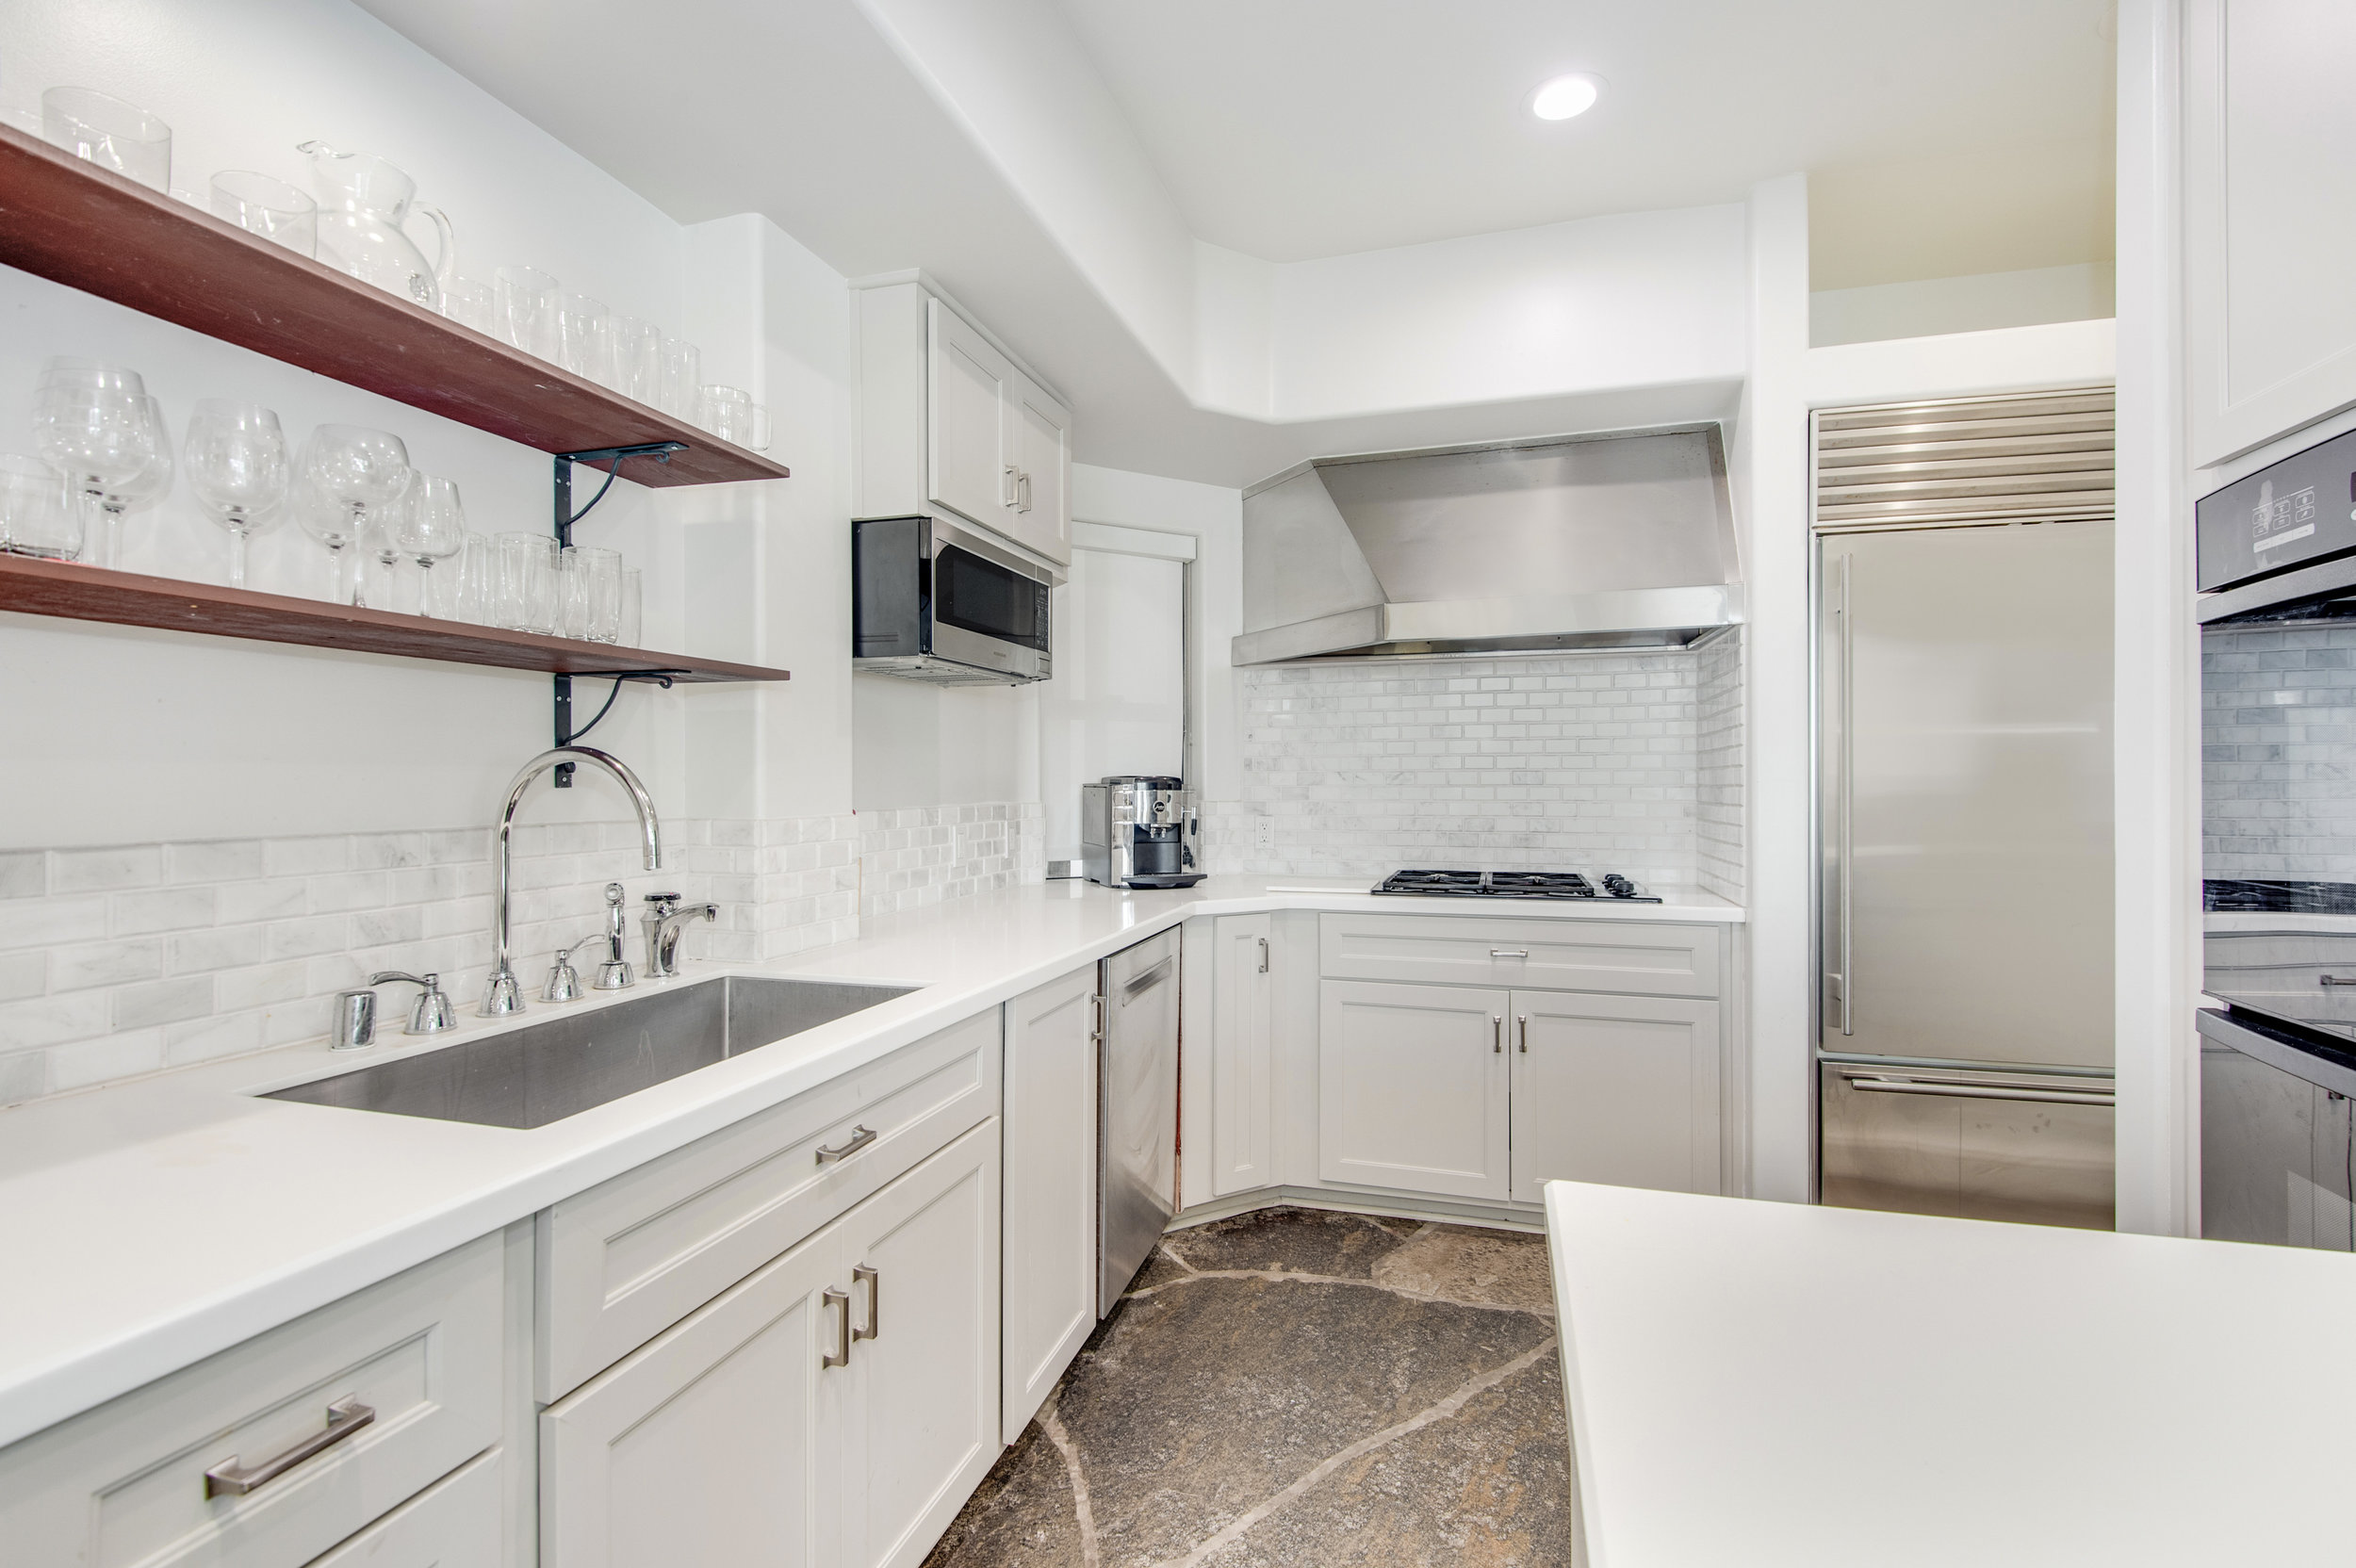 026 Kitchen 25252 Malibu Road For Sale Lease The Malibu Life Team Luxury Real Estate.jpg